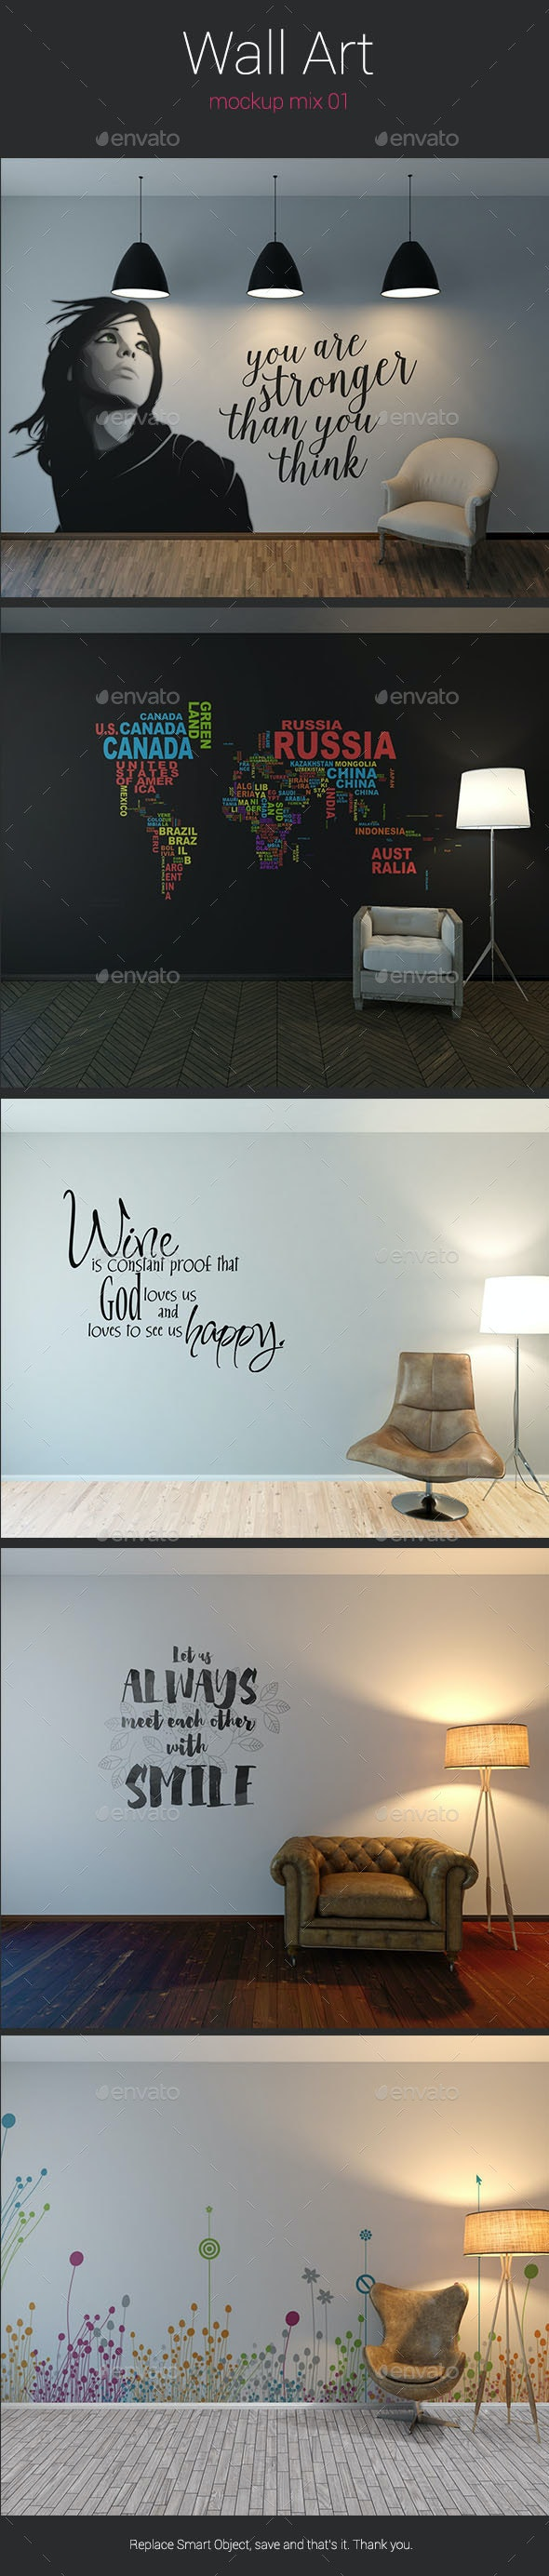 Wall Art Mockup  - Miscellaneous Displays